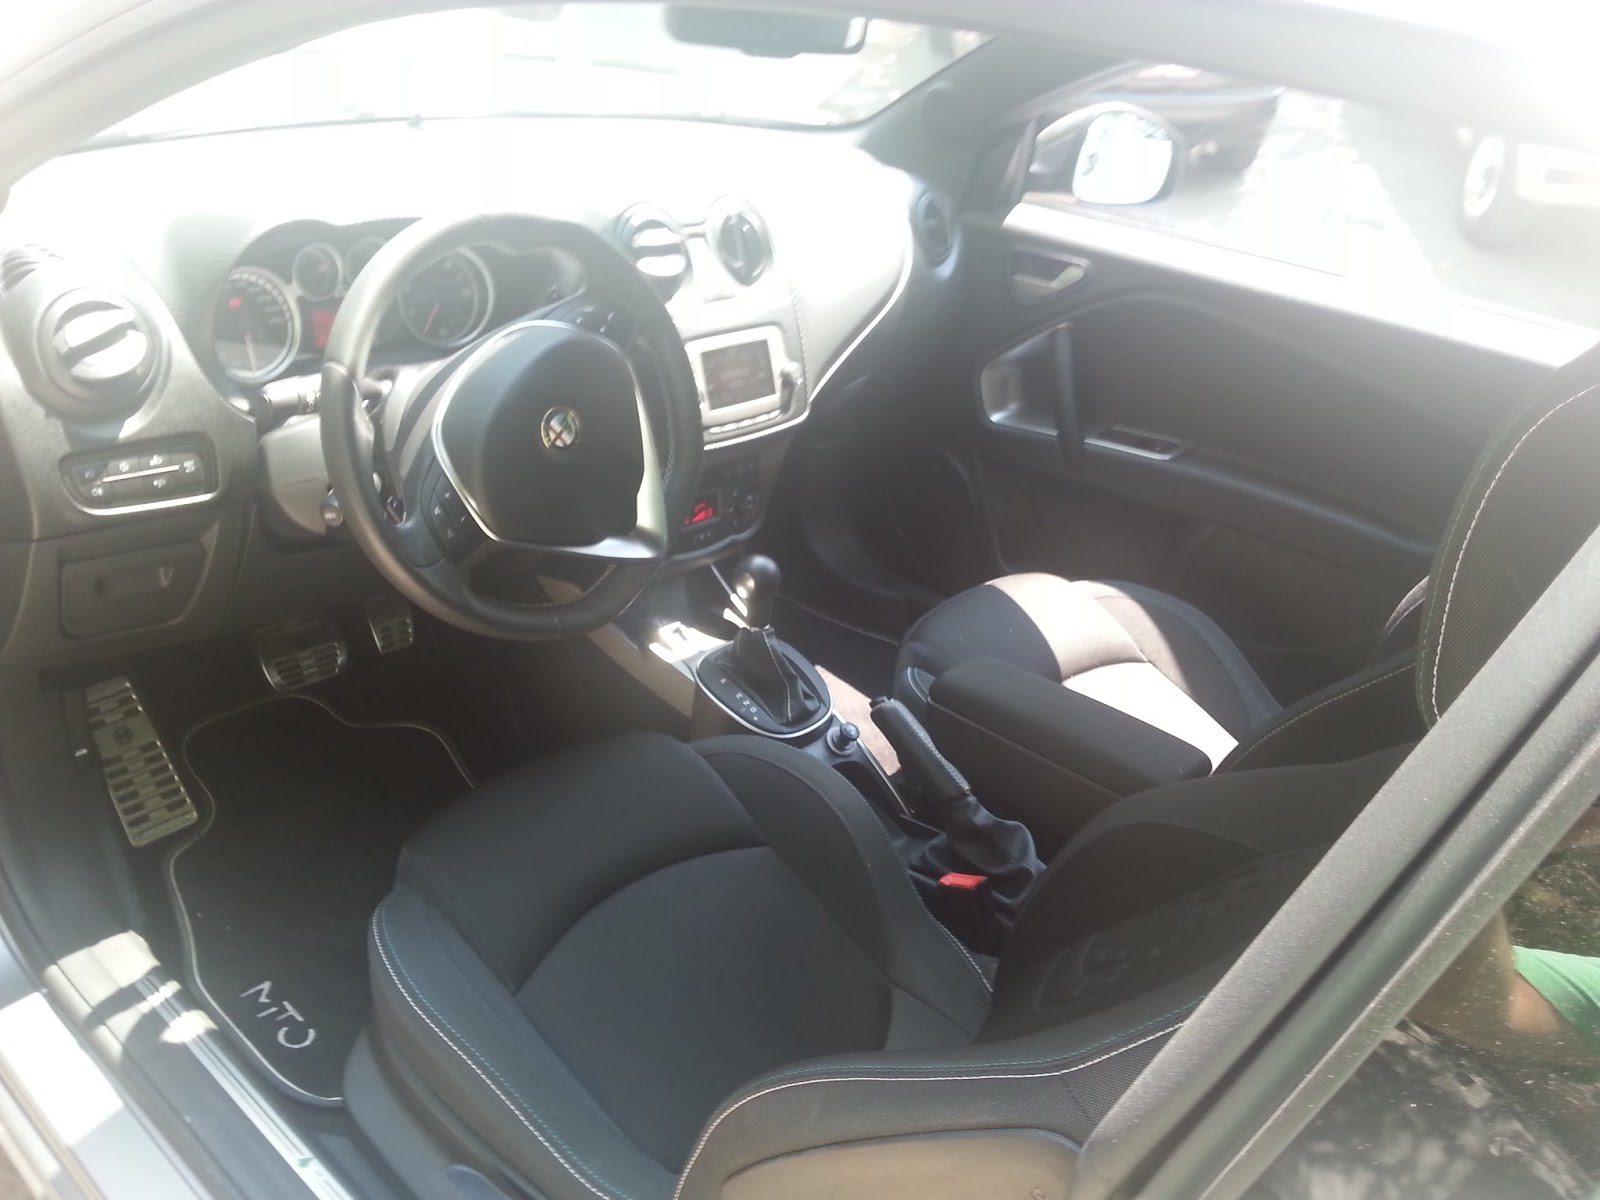 F3 Όταν έλιωσα στο στρίψιμο μια MiTo QV alfa romeo, Alfa Romeo MiTo QV, MiTo QV, zblog, ΔΟΚΙΜΕΣ